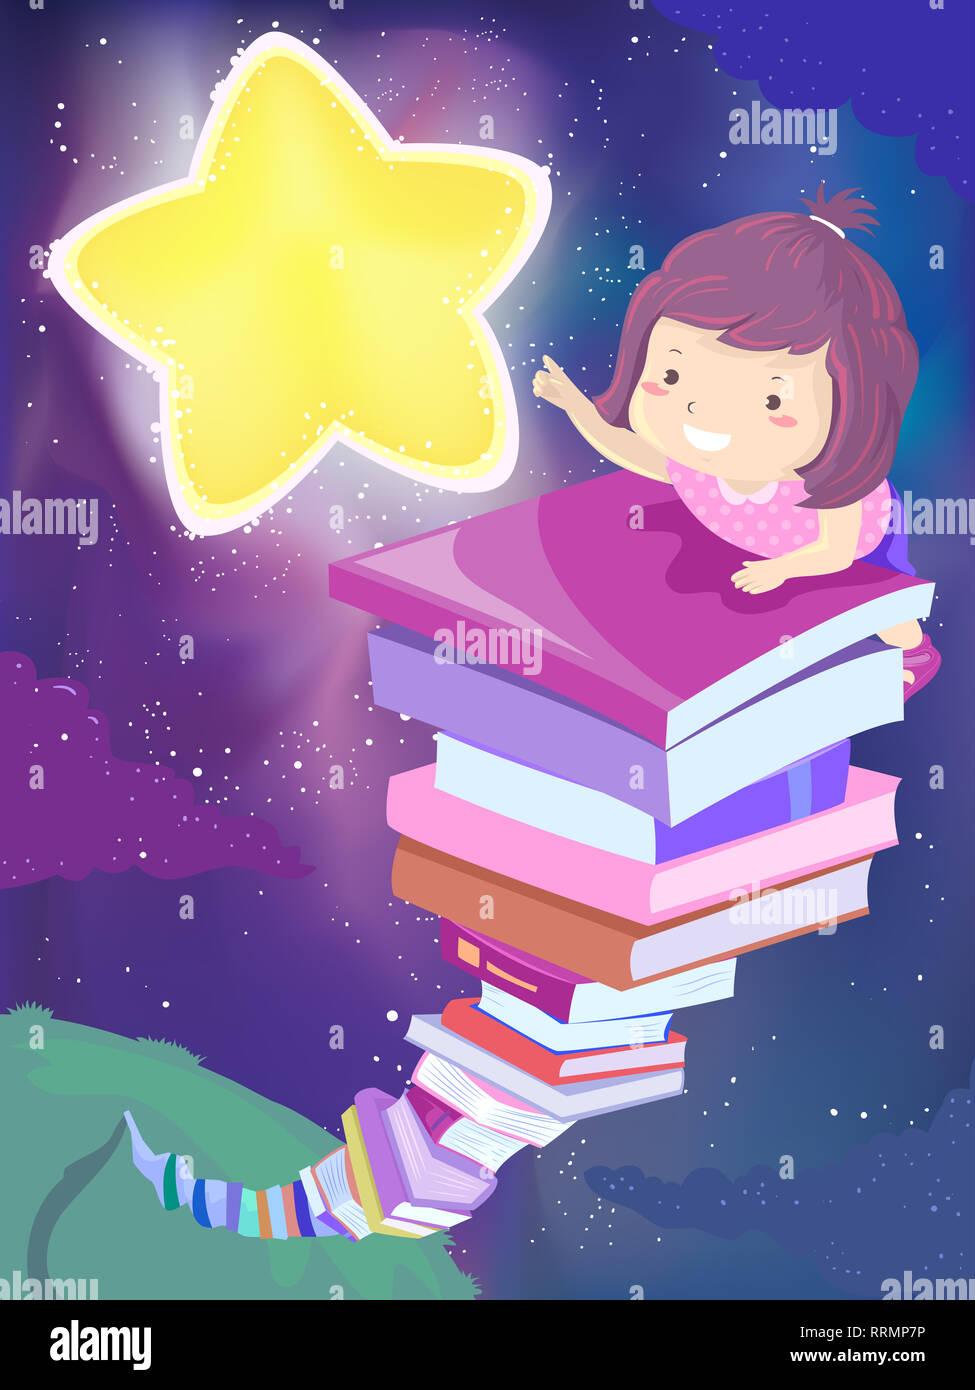 Book Child Reading Drawing Illustration - Stack Of Books Clipart #1318591 | Reading  books illustration, Drawing illustrations, Clip art